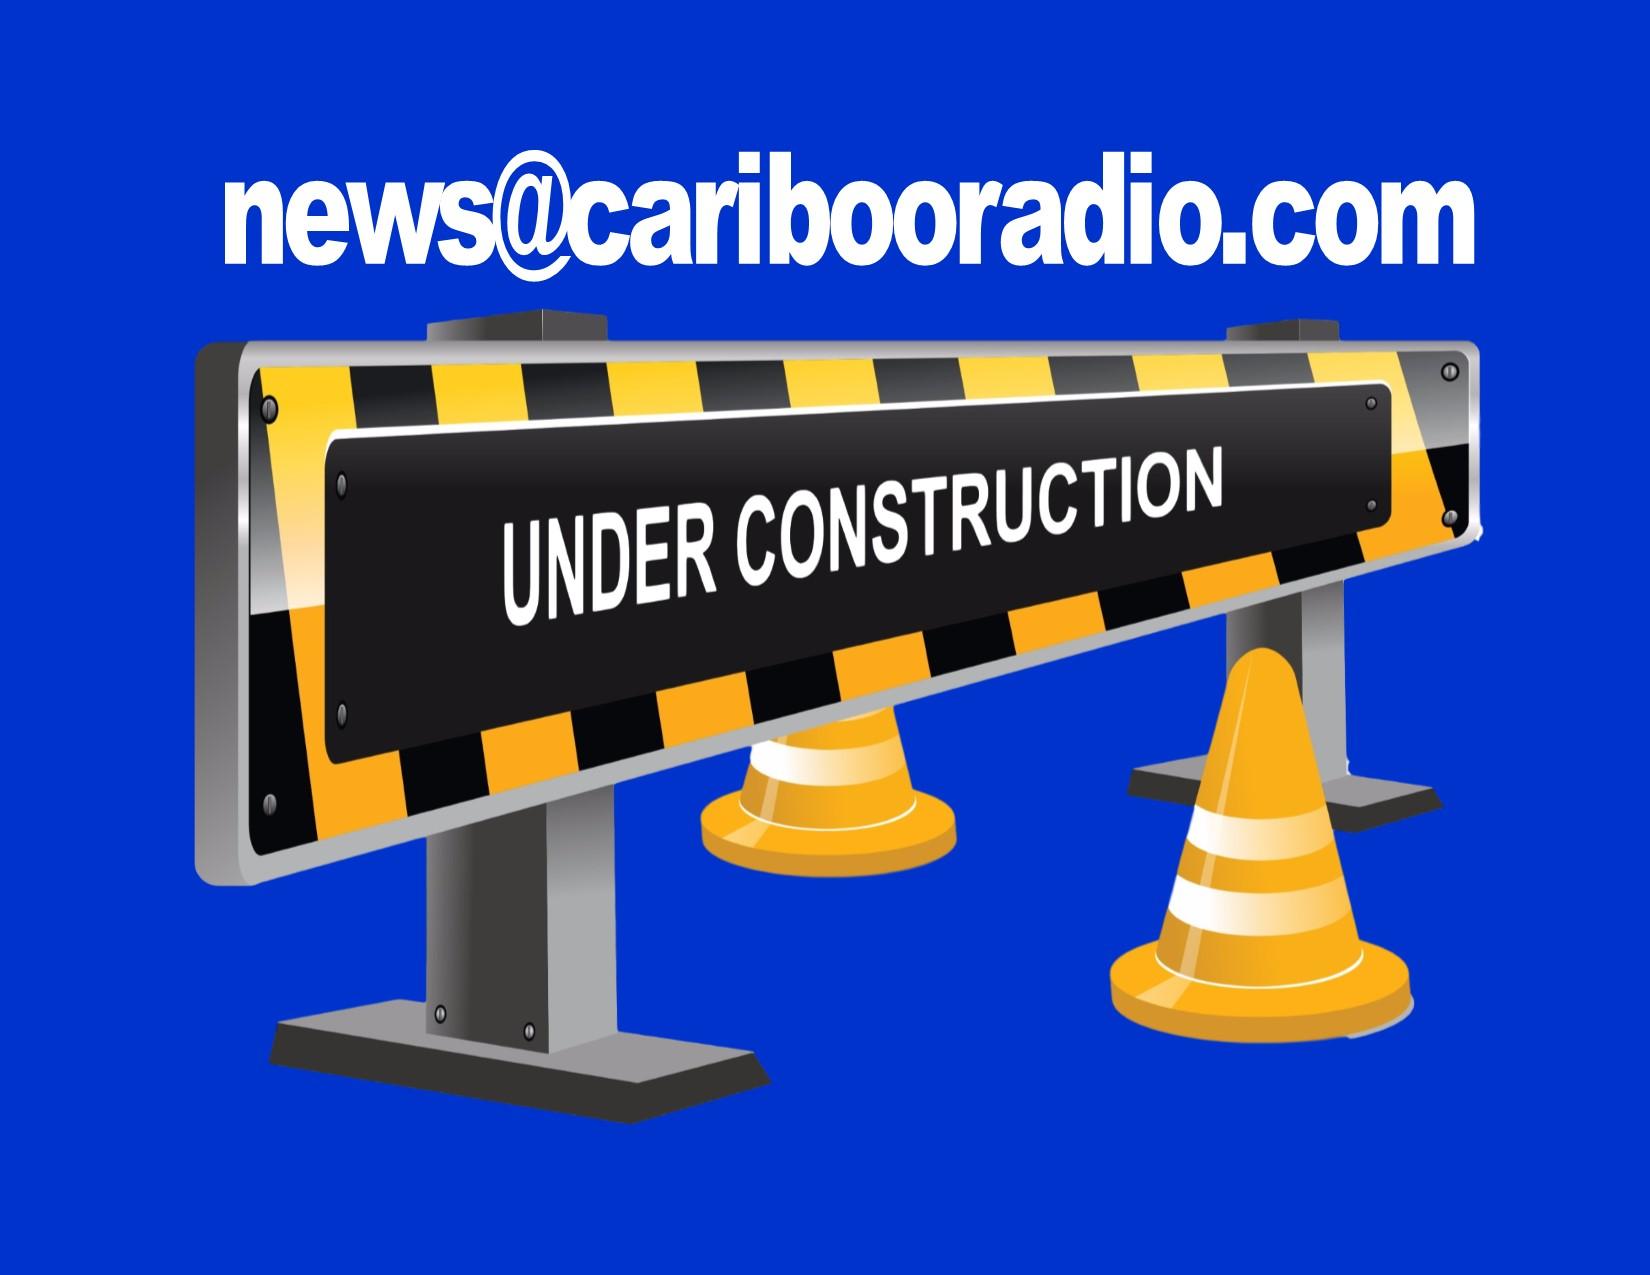 under-construction_news@hotmail.com_